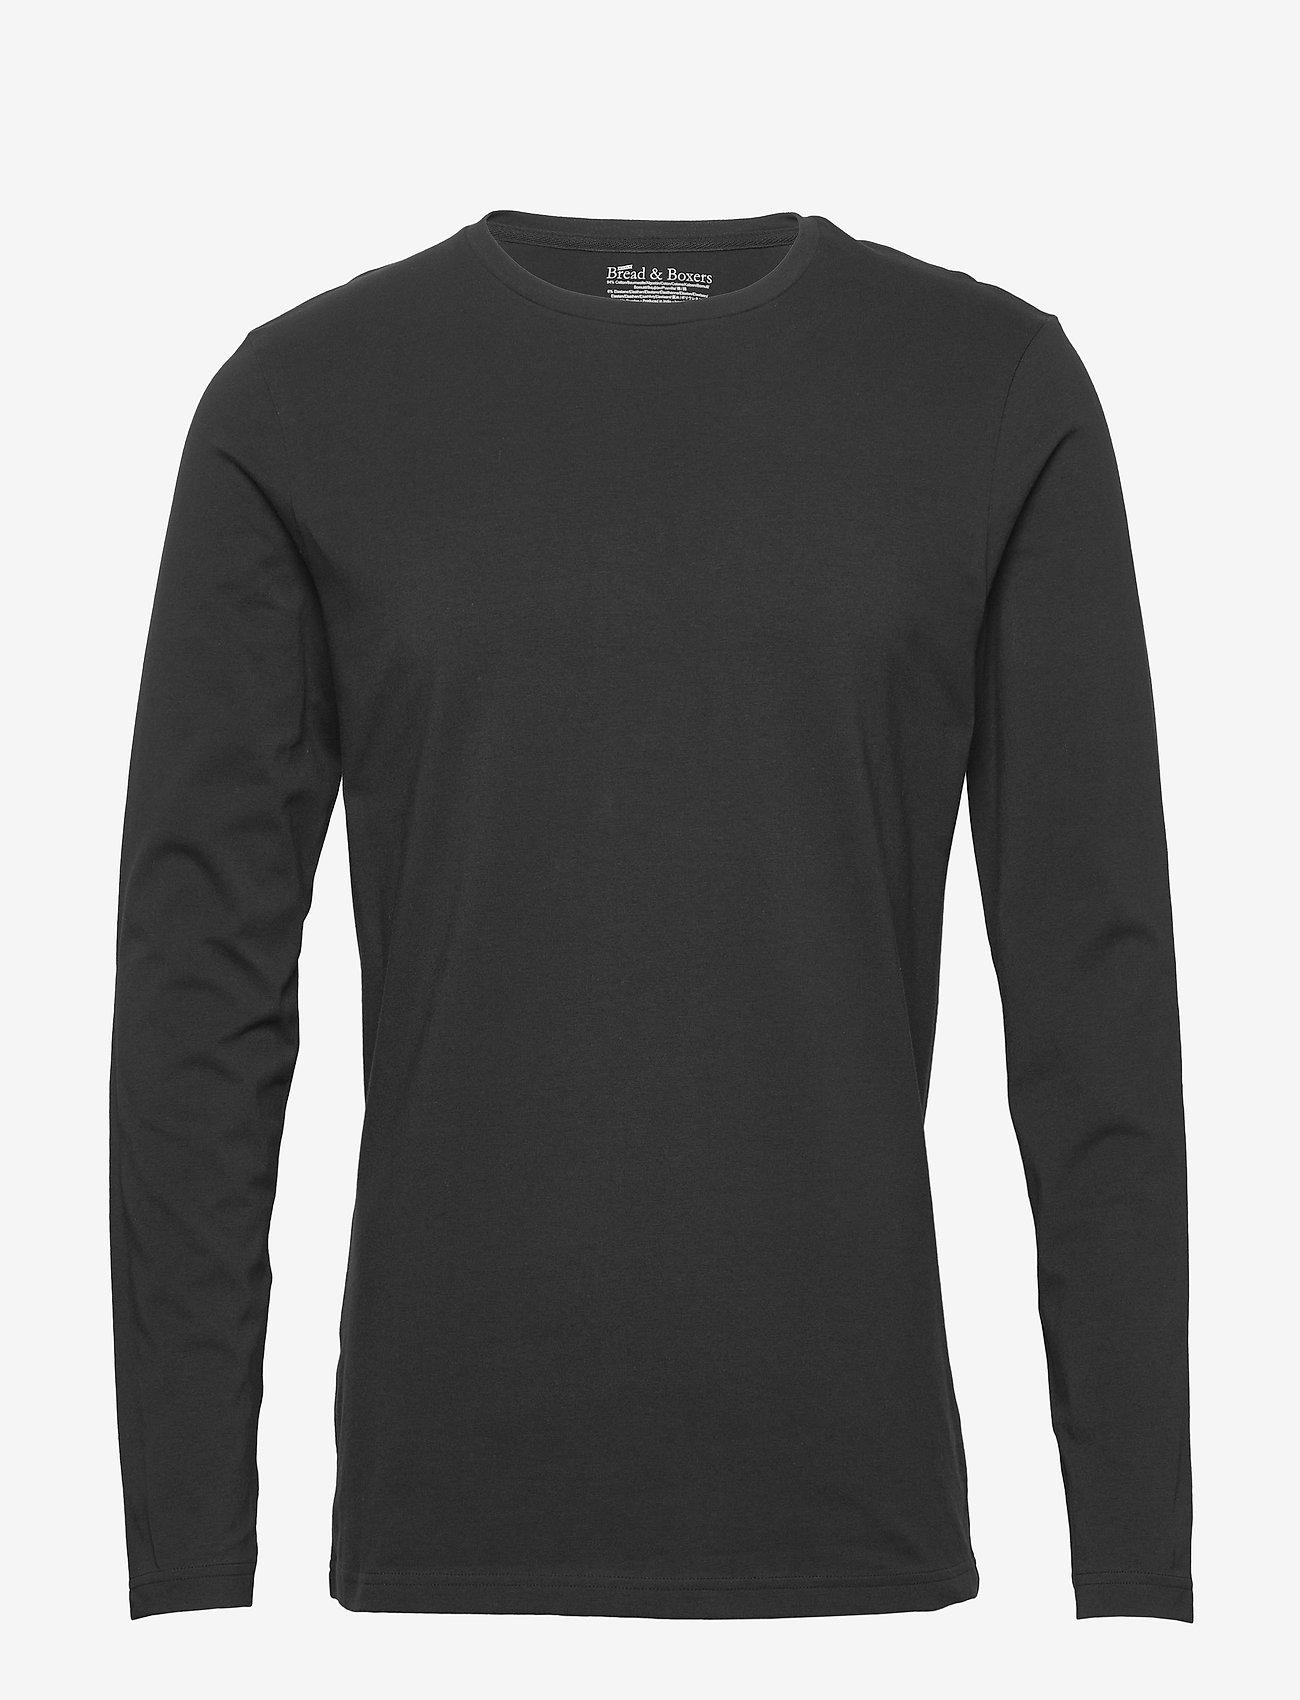 Bread & Boxers - Long sleeve - basic t-shirts - black - 0